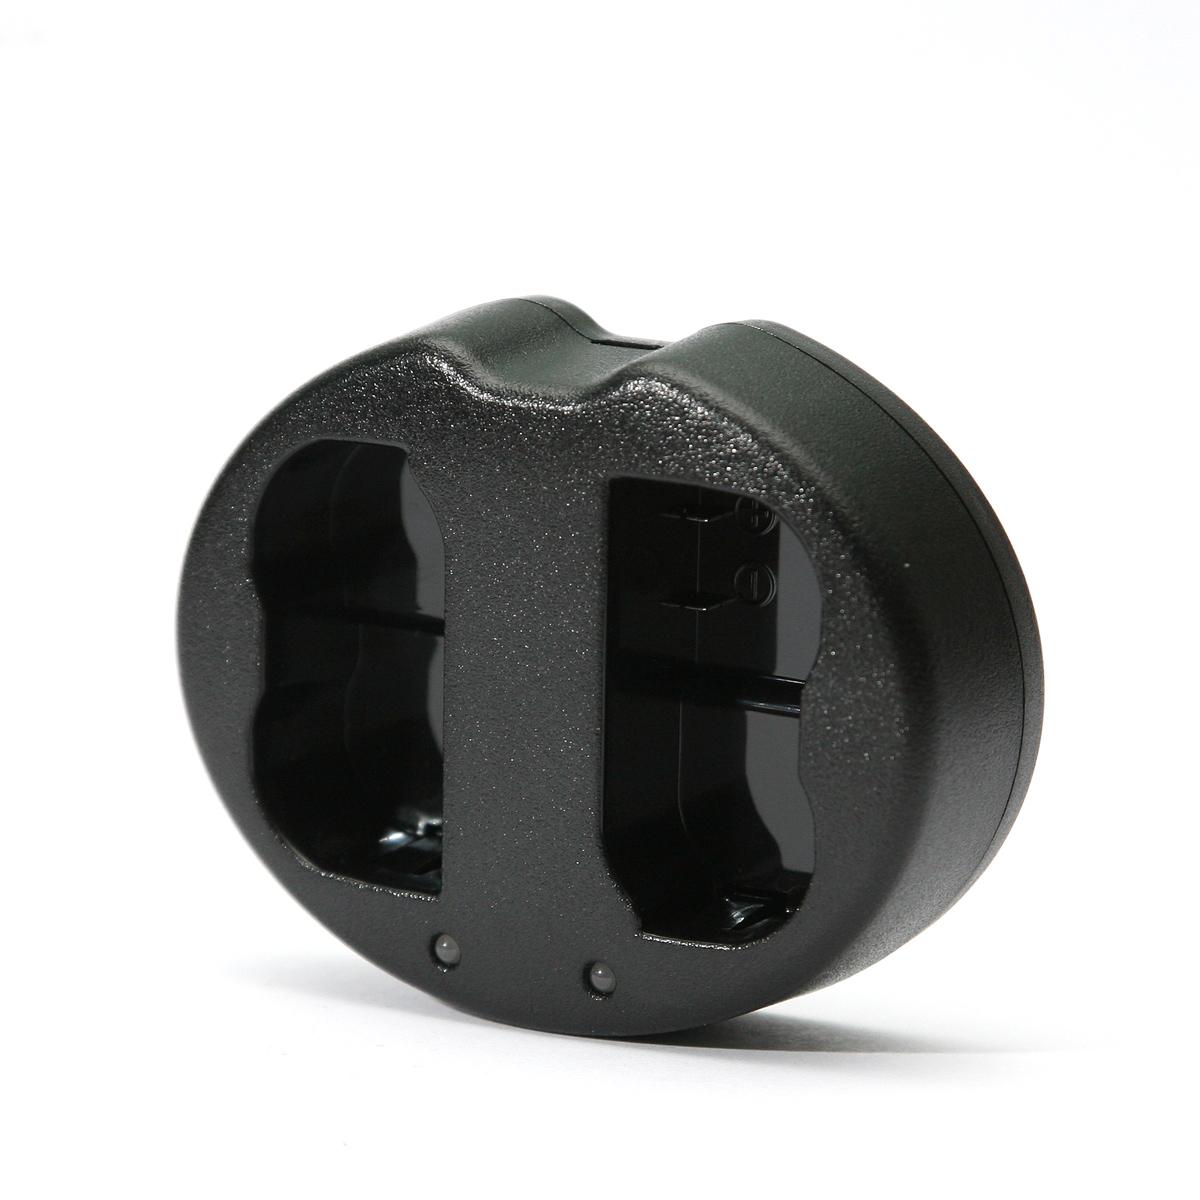 Купить Зарядное устройство PowerPlant Dual Canon LP-E10 для двух аккумуляторов